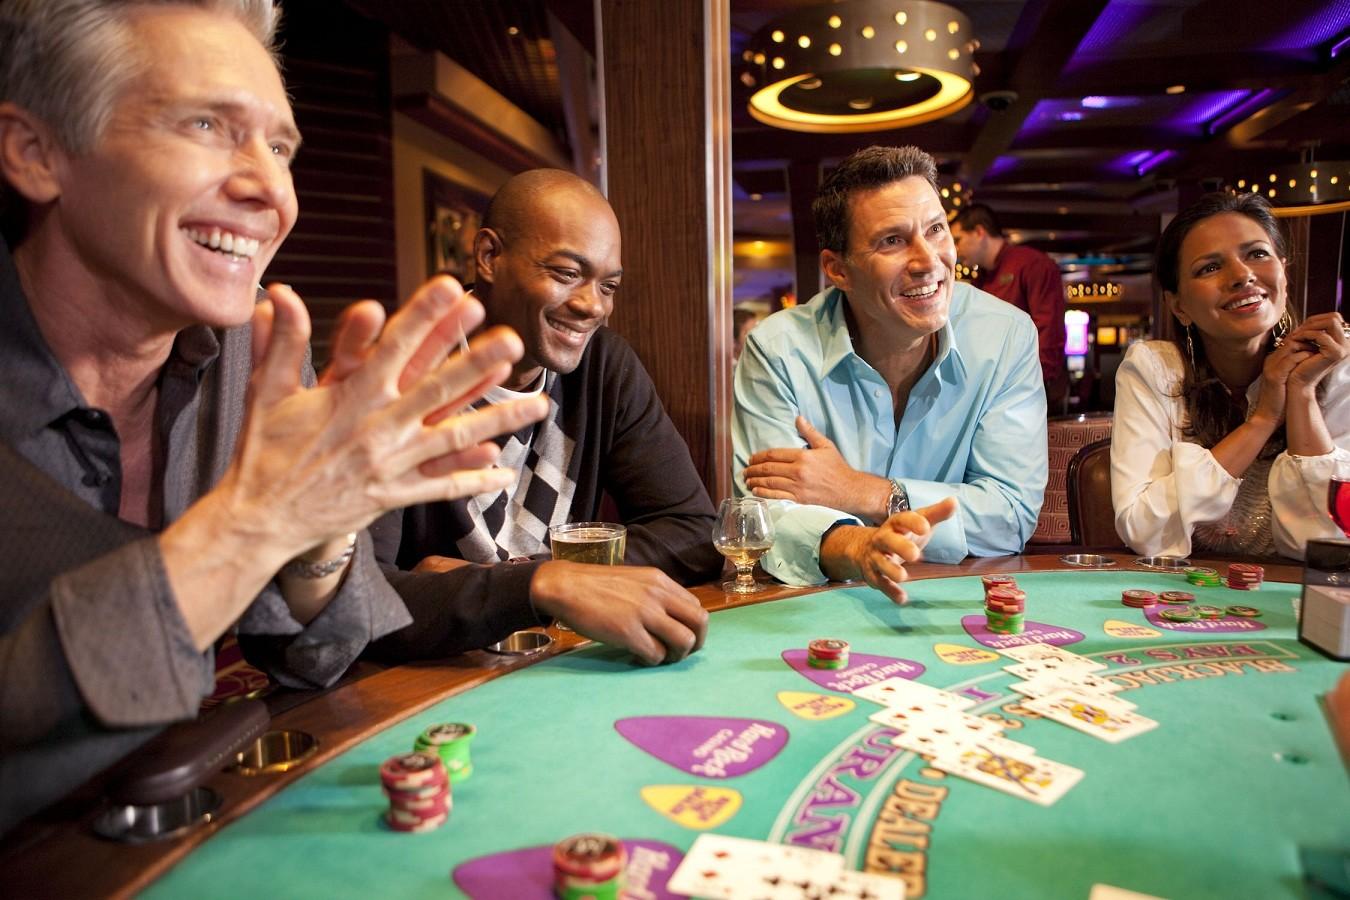 Las vegas casino poker